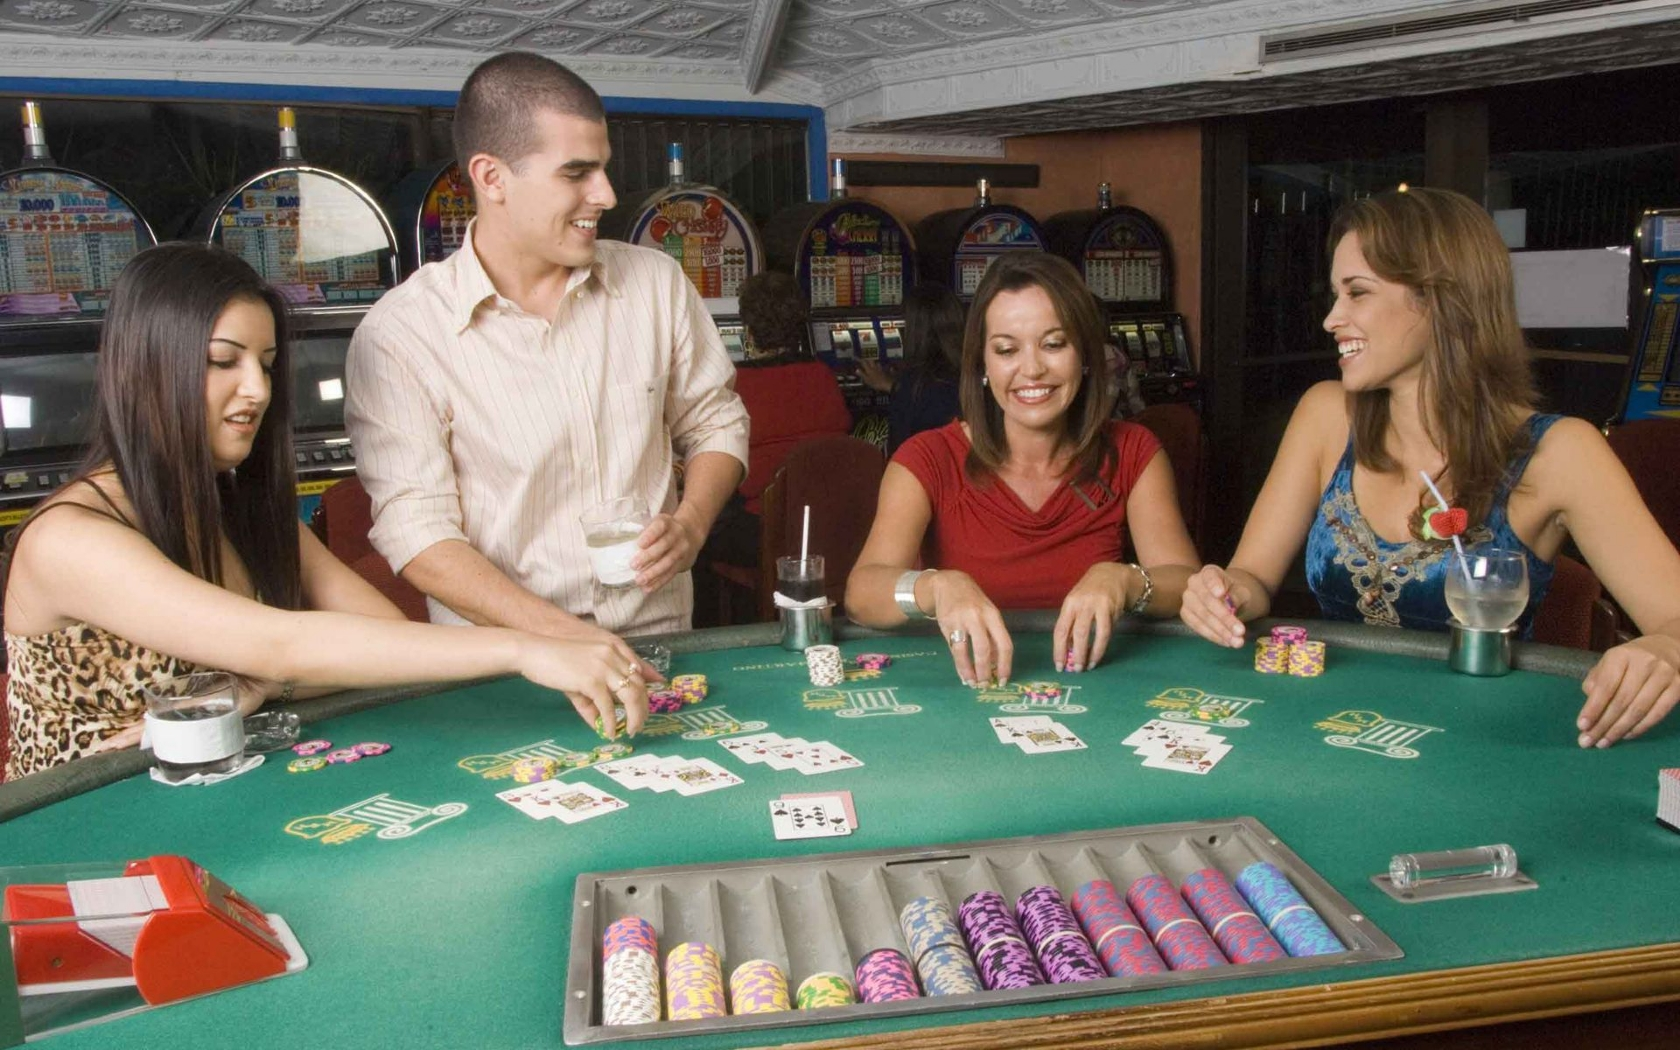 Major tips to play pokie machines: